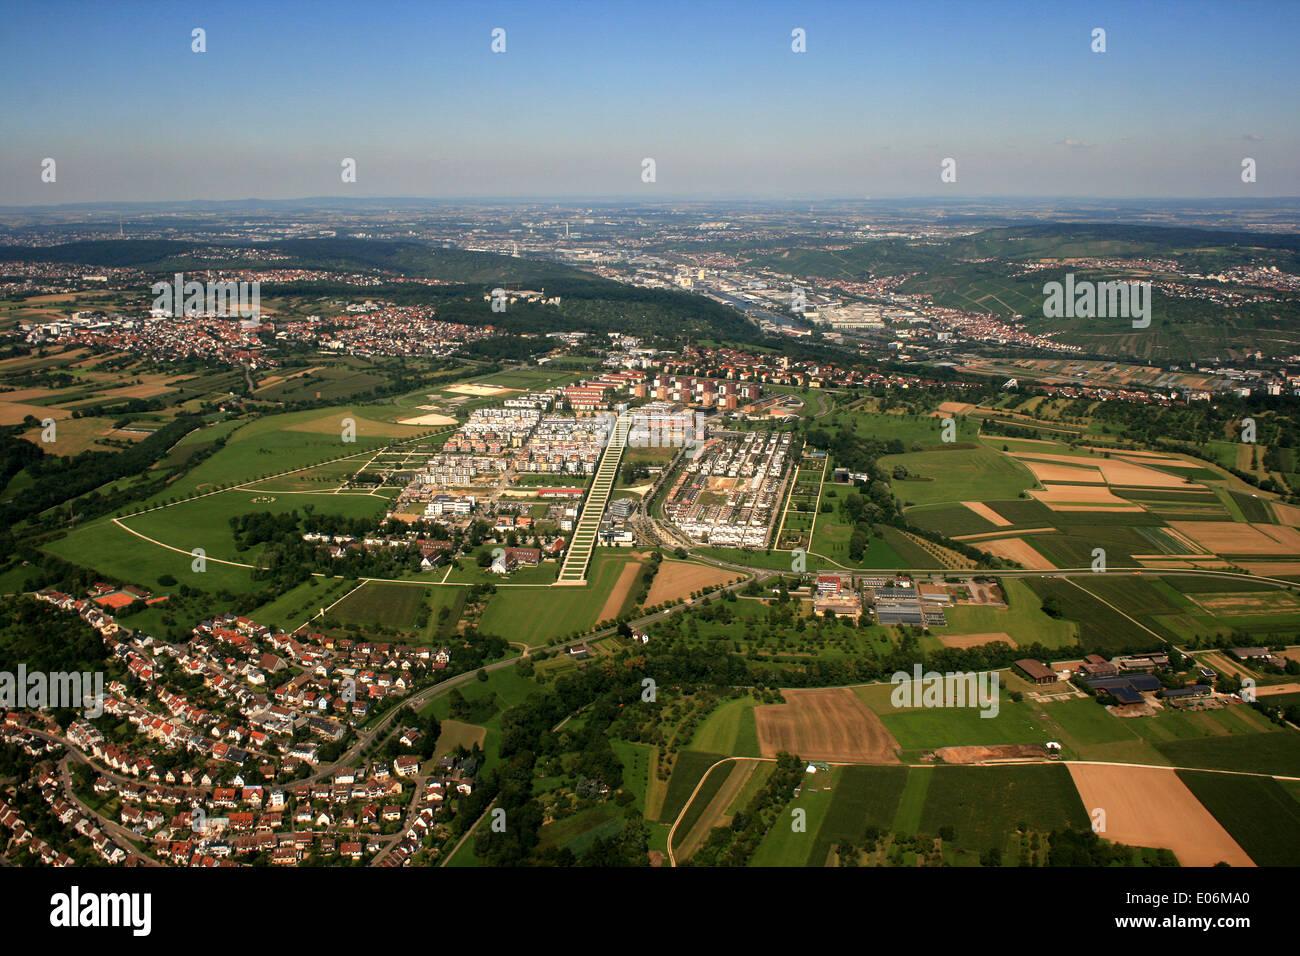 aerial photo of stuttgart - germany Stock Photo